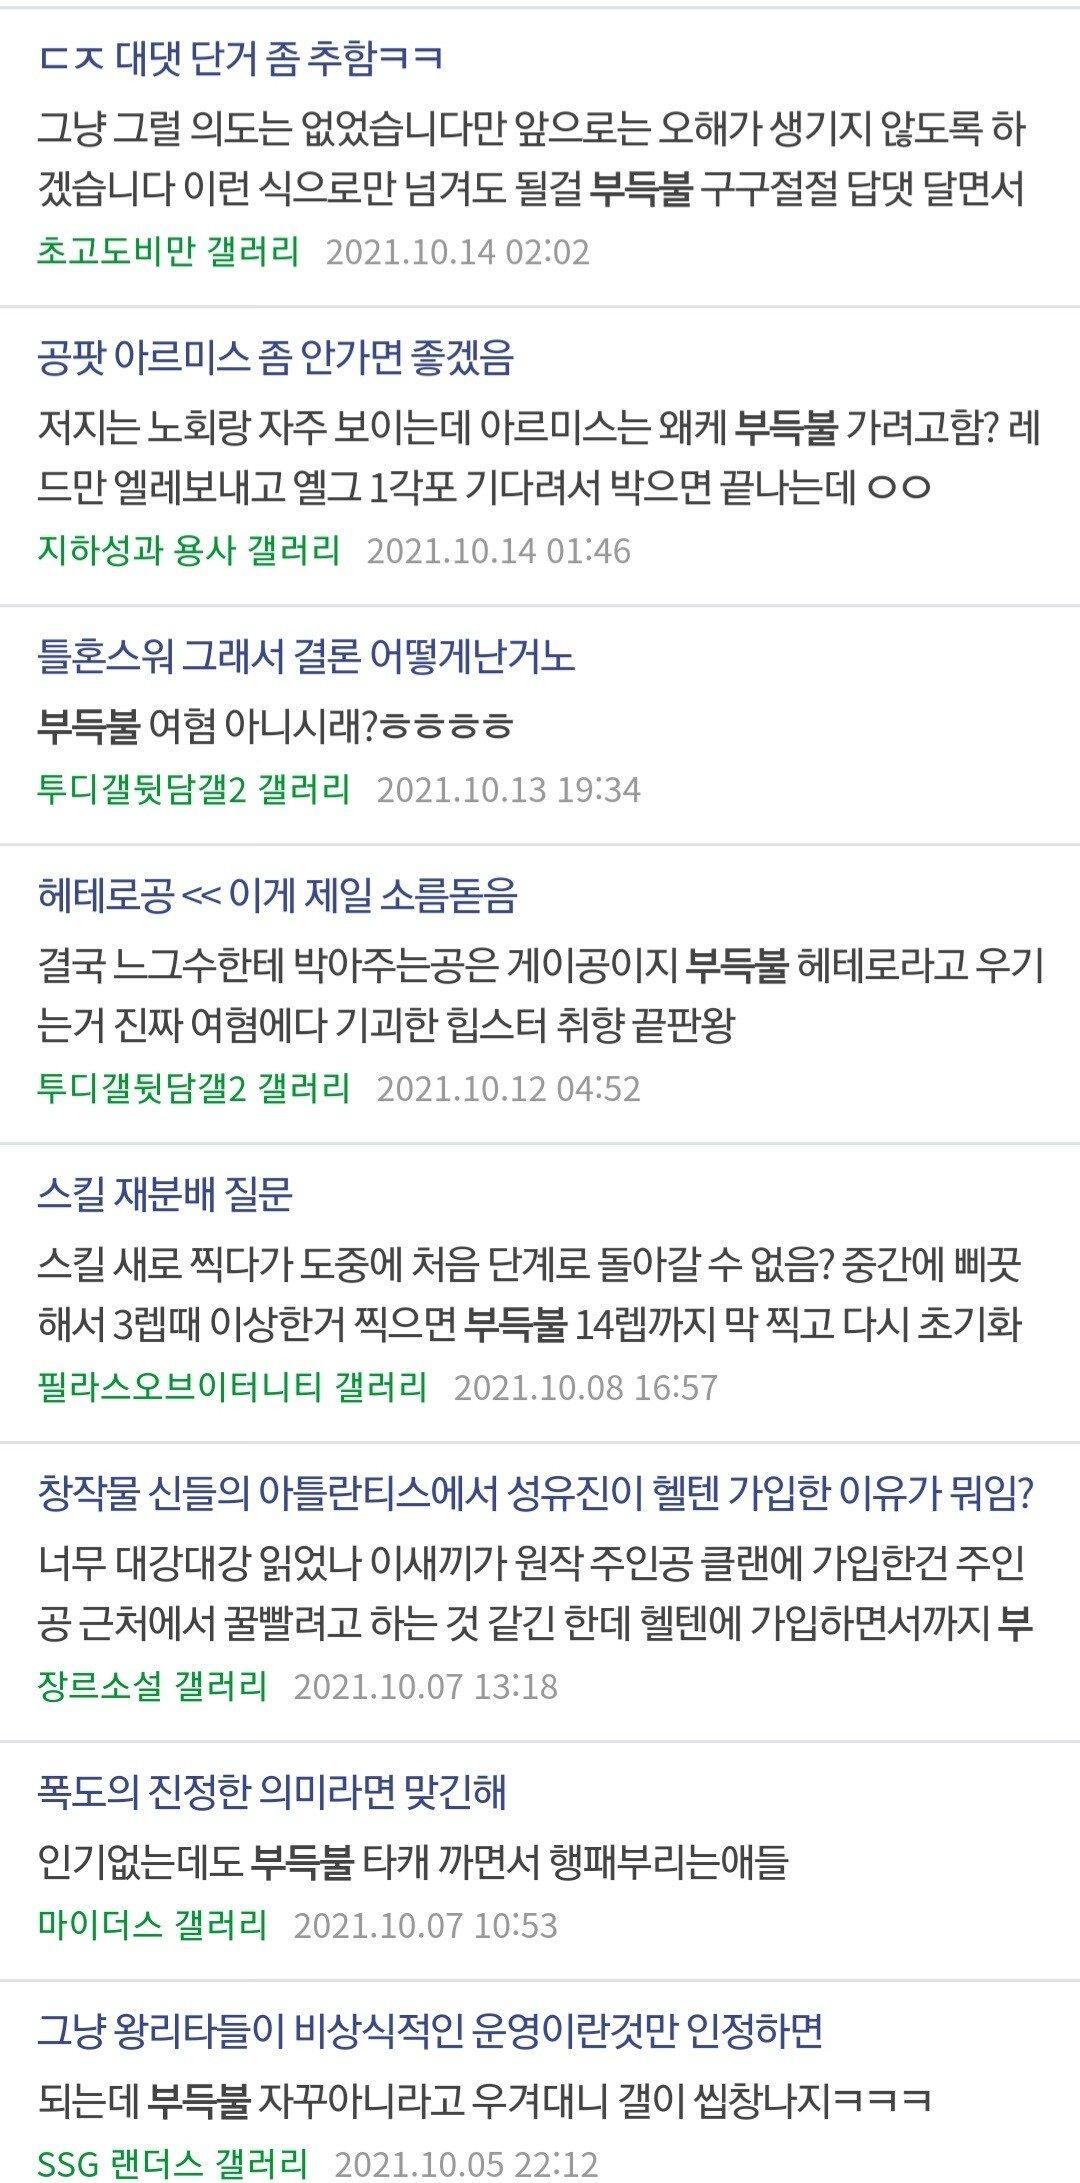 Screenshot_20211014-090009_Samsung Internet.jpg 요새 커뮤니티 키배에서 자주 보이는 단어